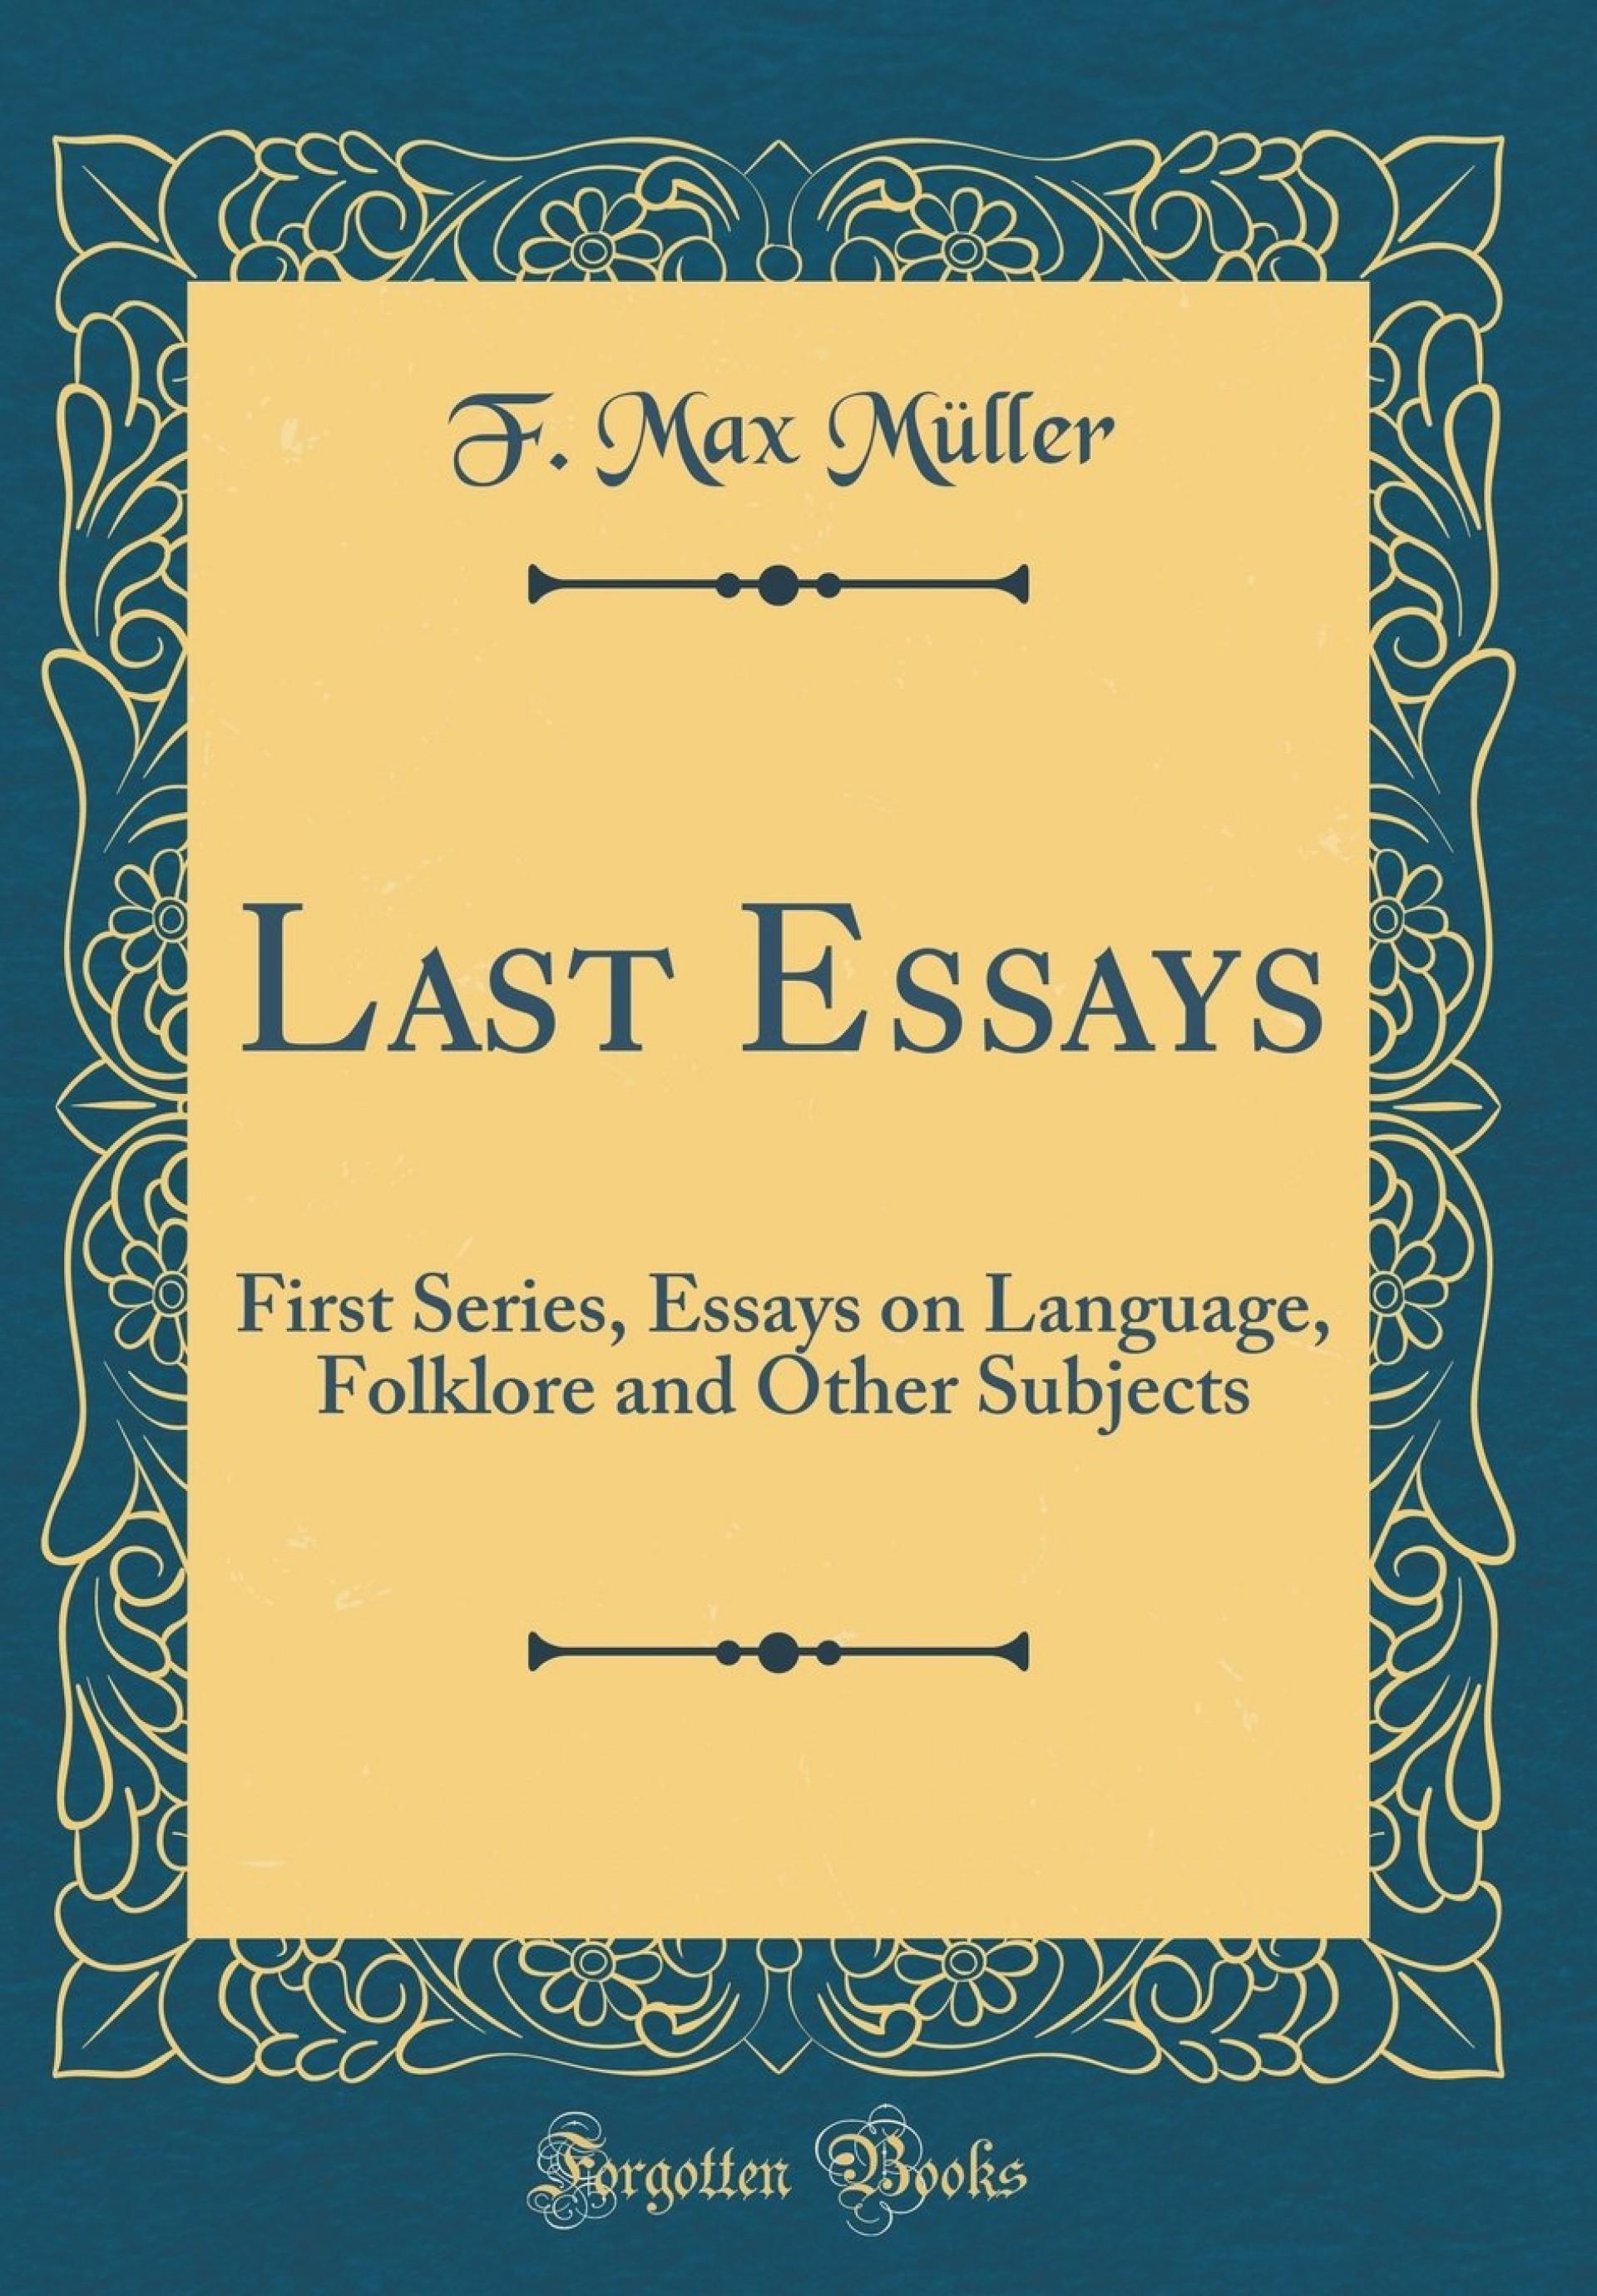 016 712b4xpd8bkl Essays First Series Essay Stunning Emerson Pdf Shelburne Publisher 1920